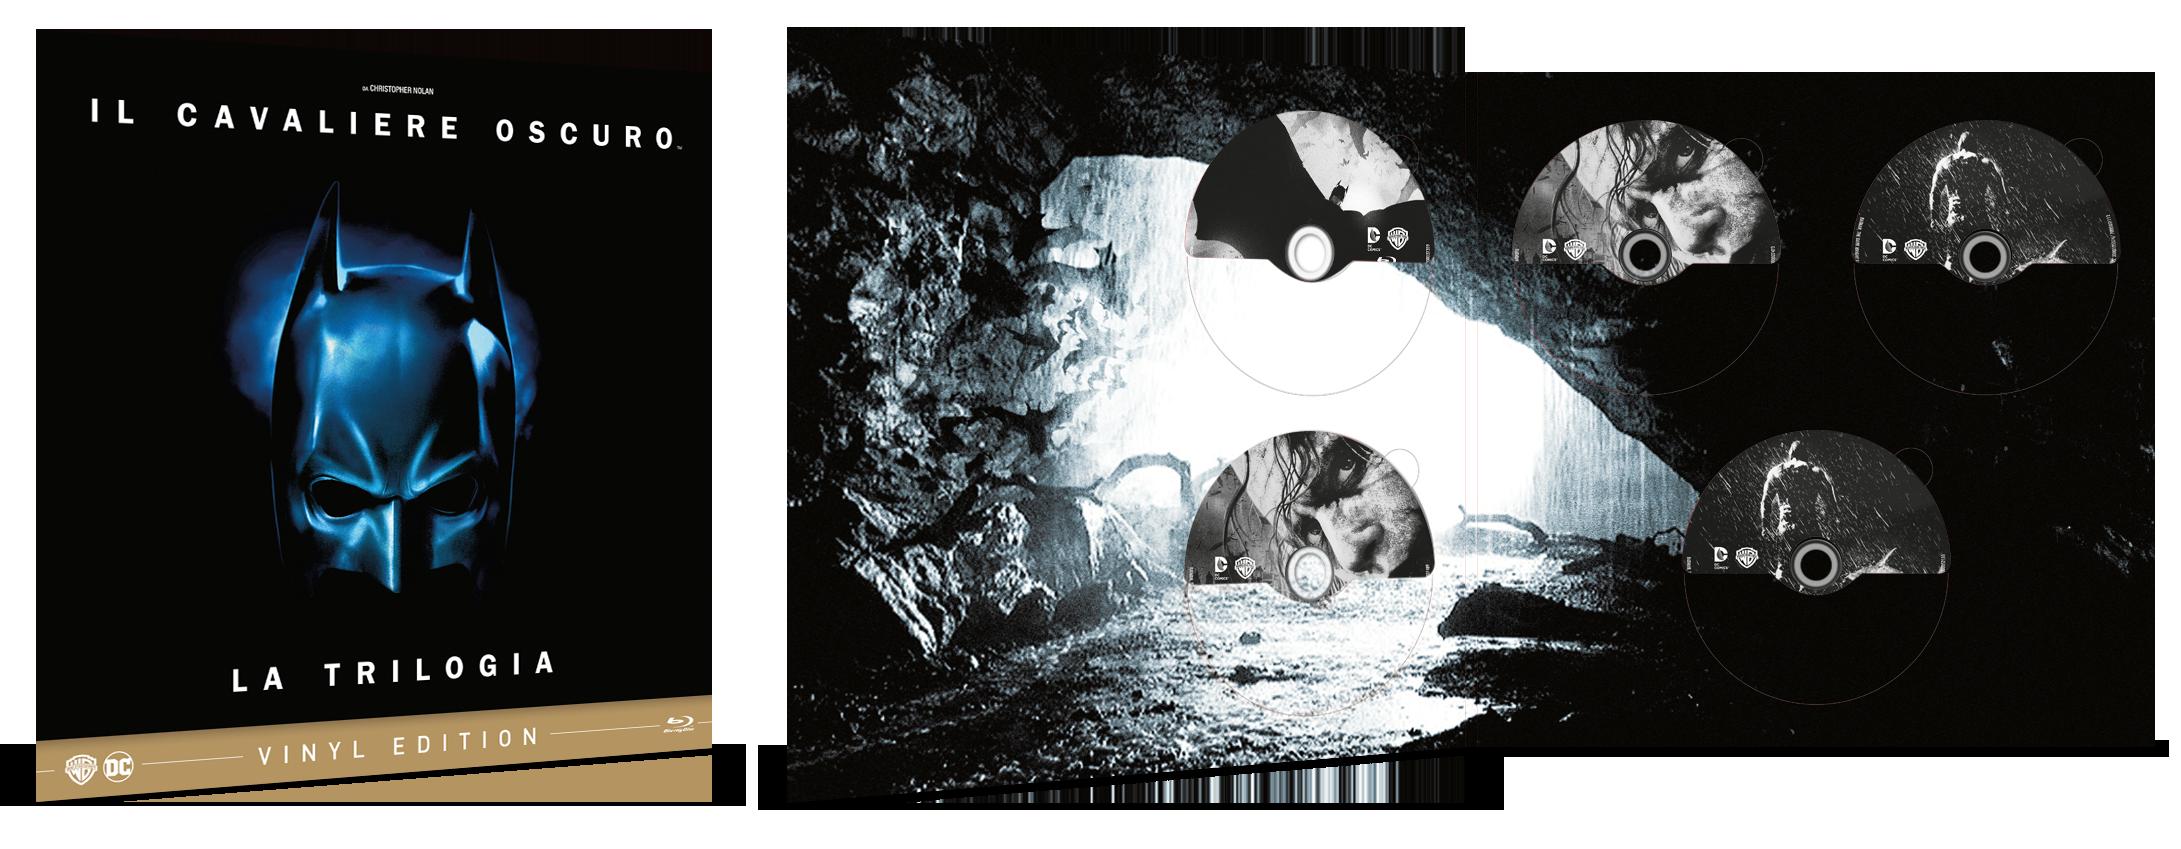 La Vinyl Edition de Il Cavaliere Oscuro